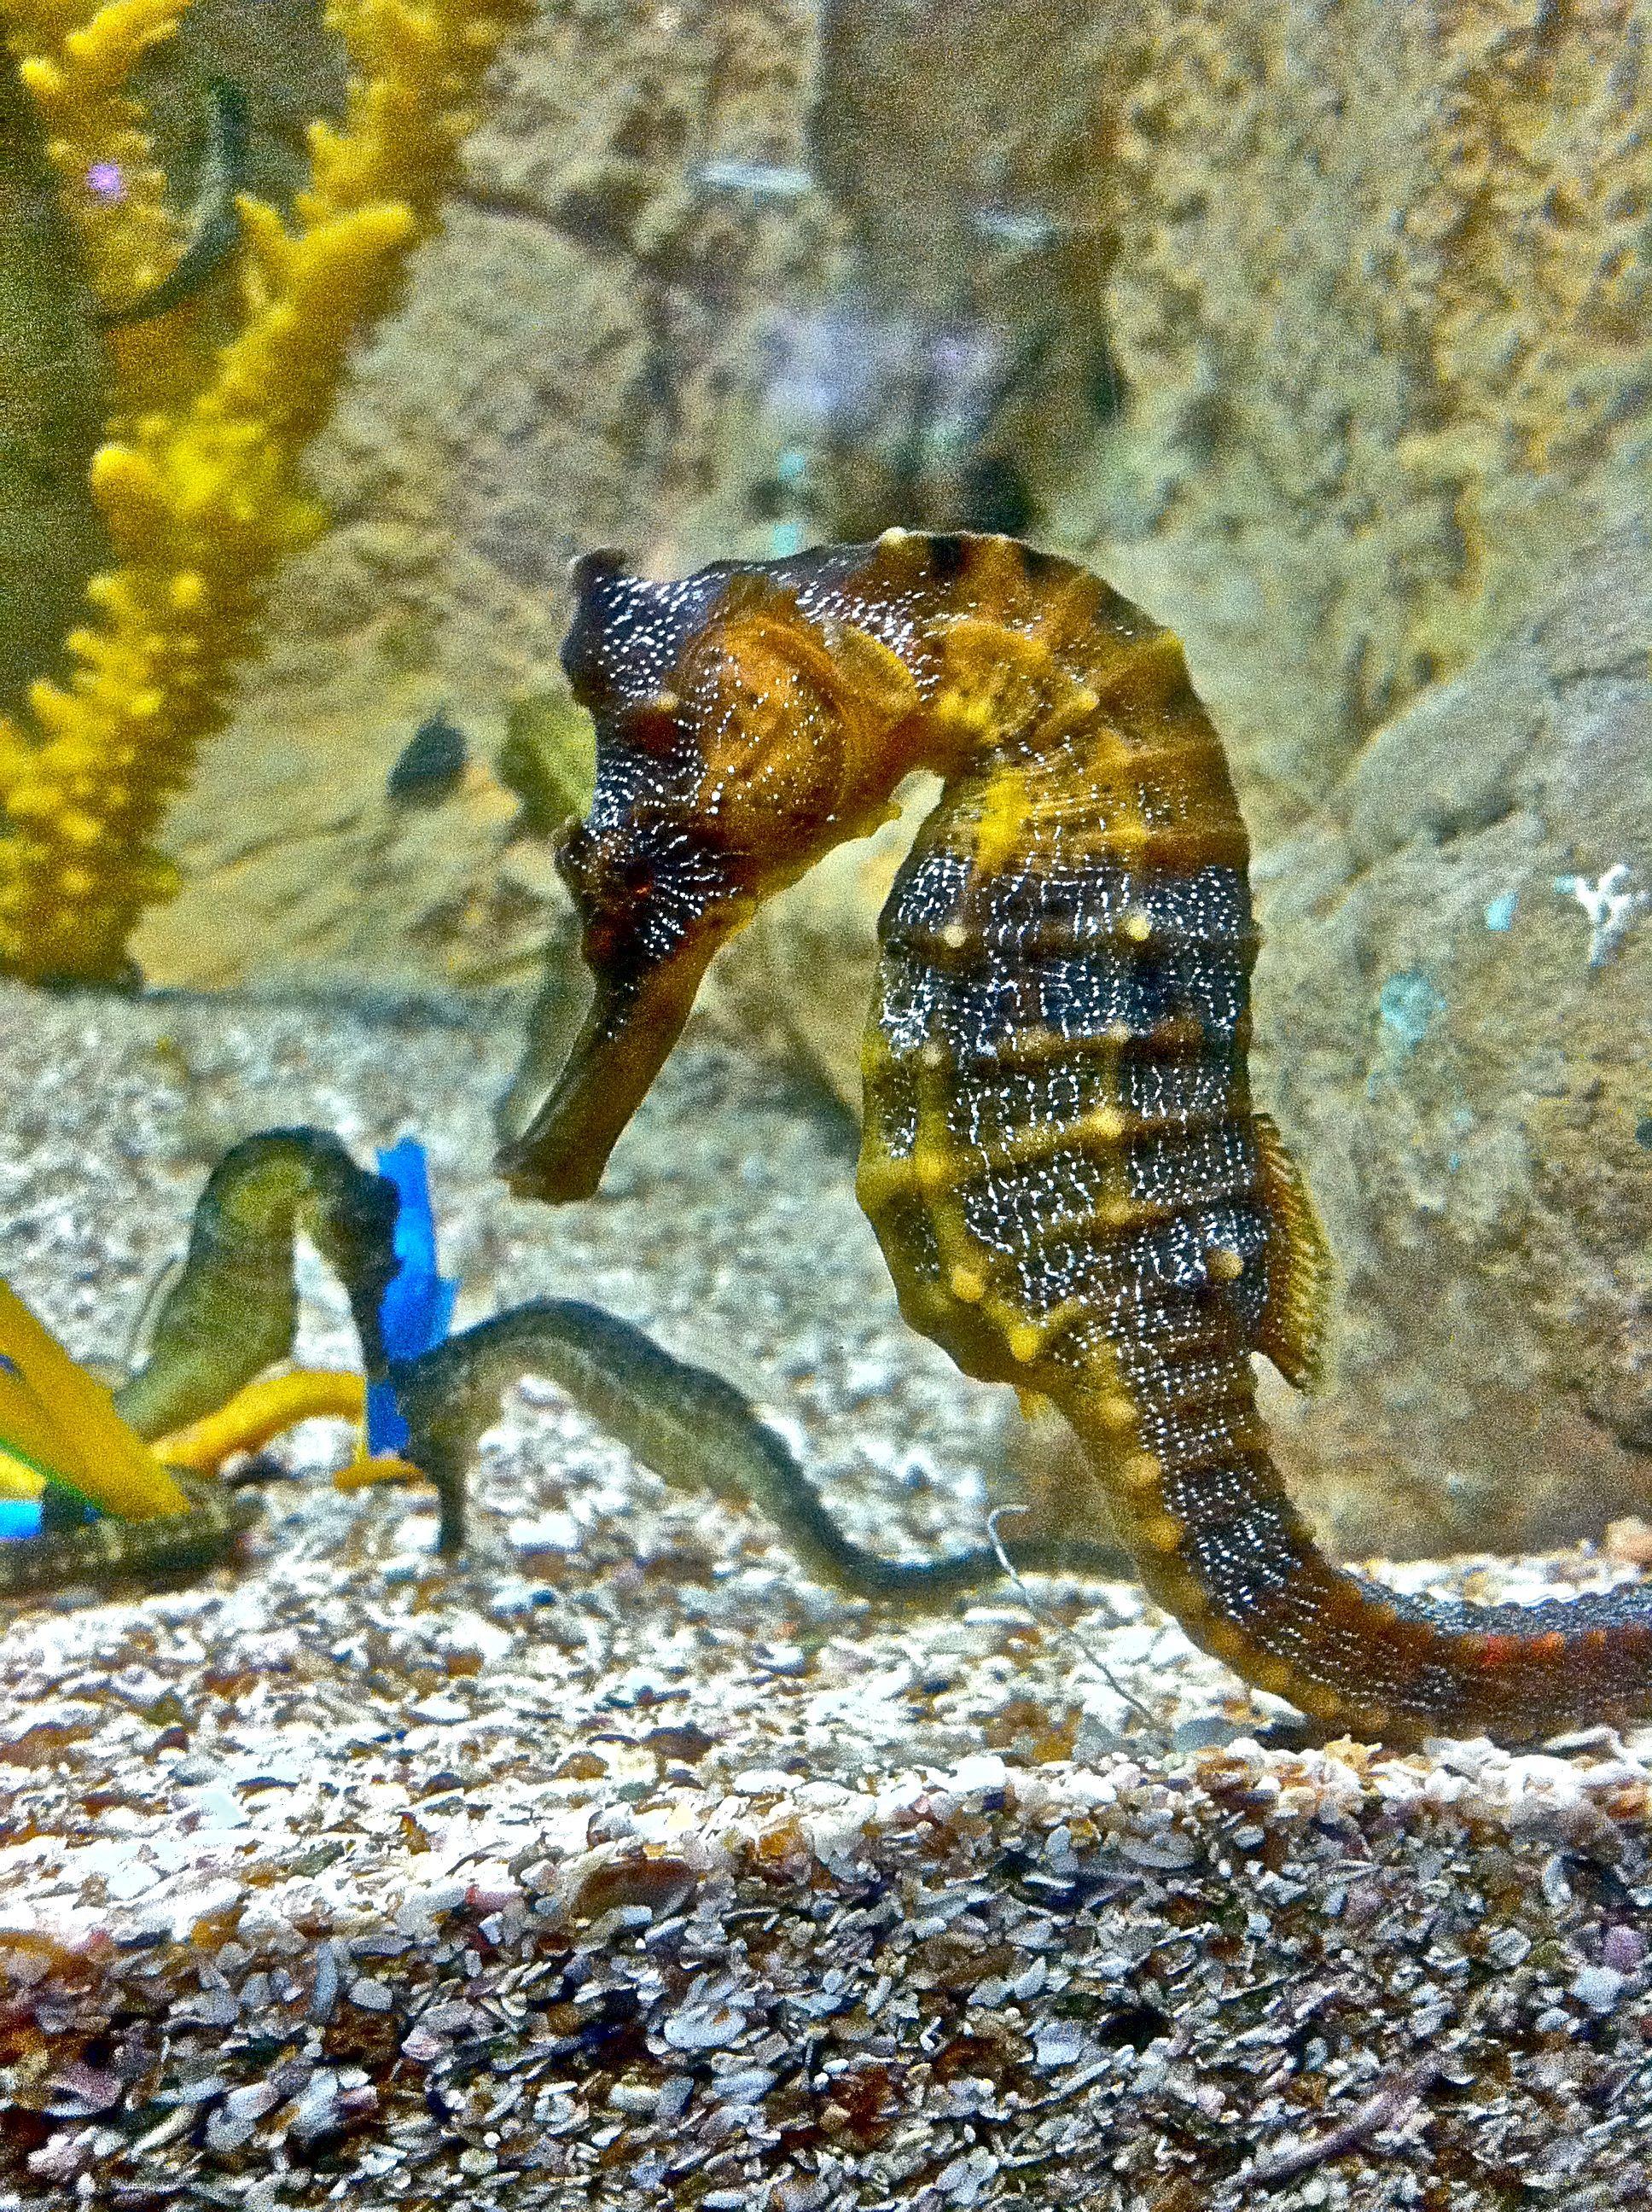 Sea Horse photograph taken at the Aquarium in Mazatlan - Mexico ...